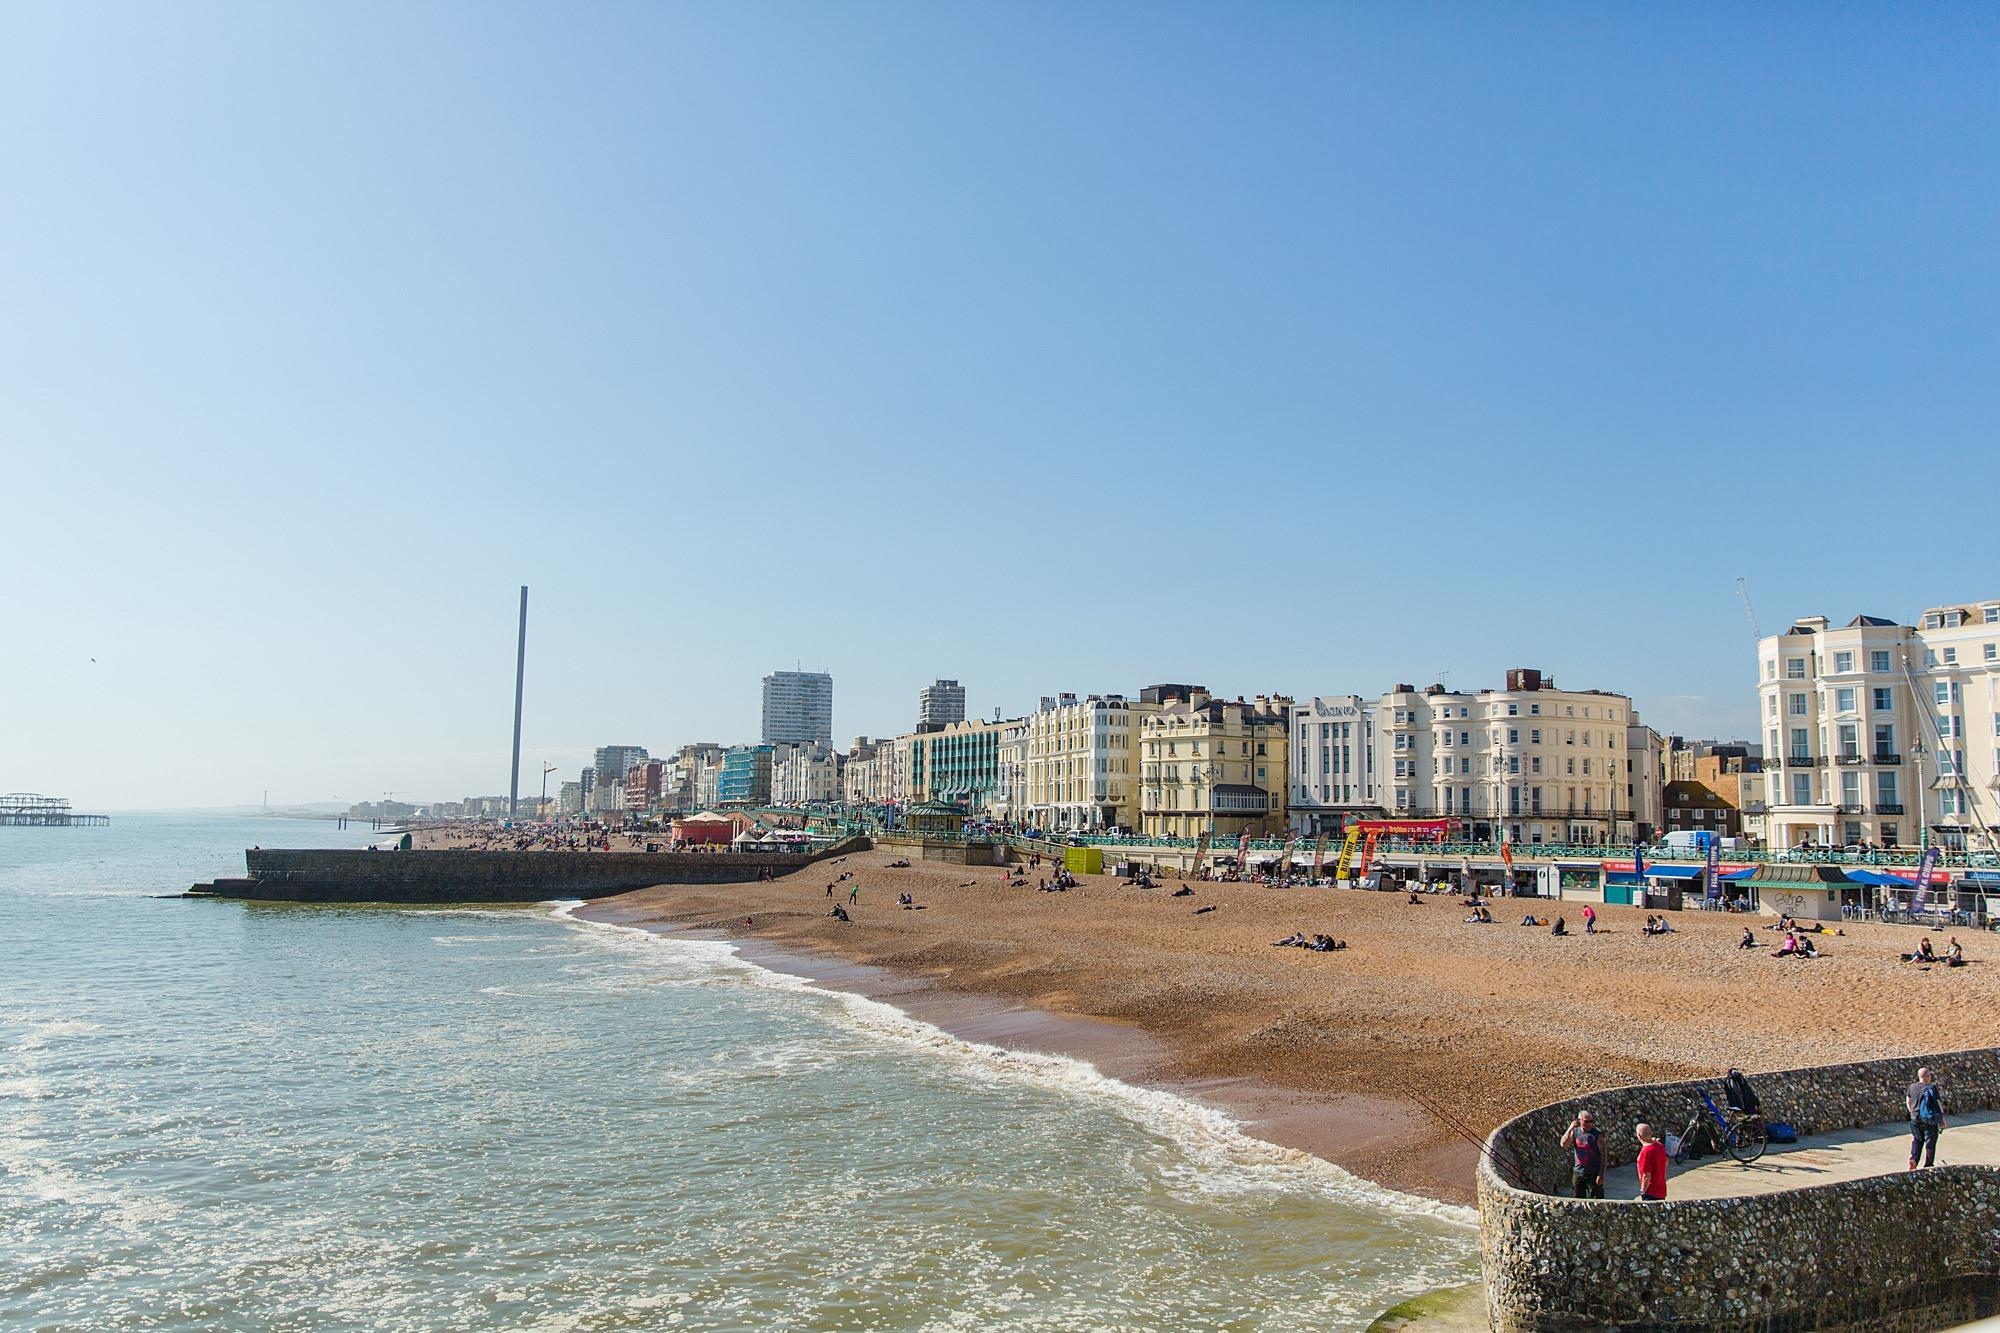 Fun Brighton engagement shoot view if brighton beach from pier